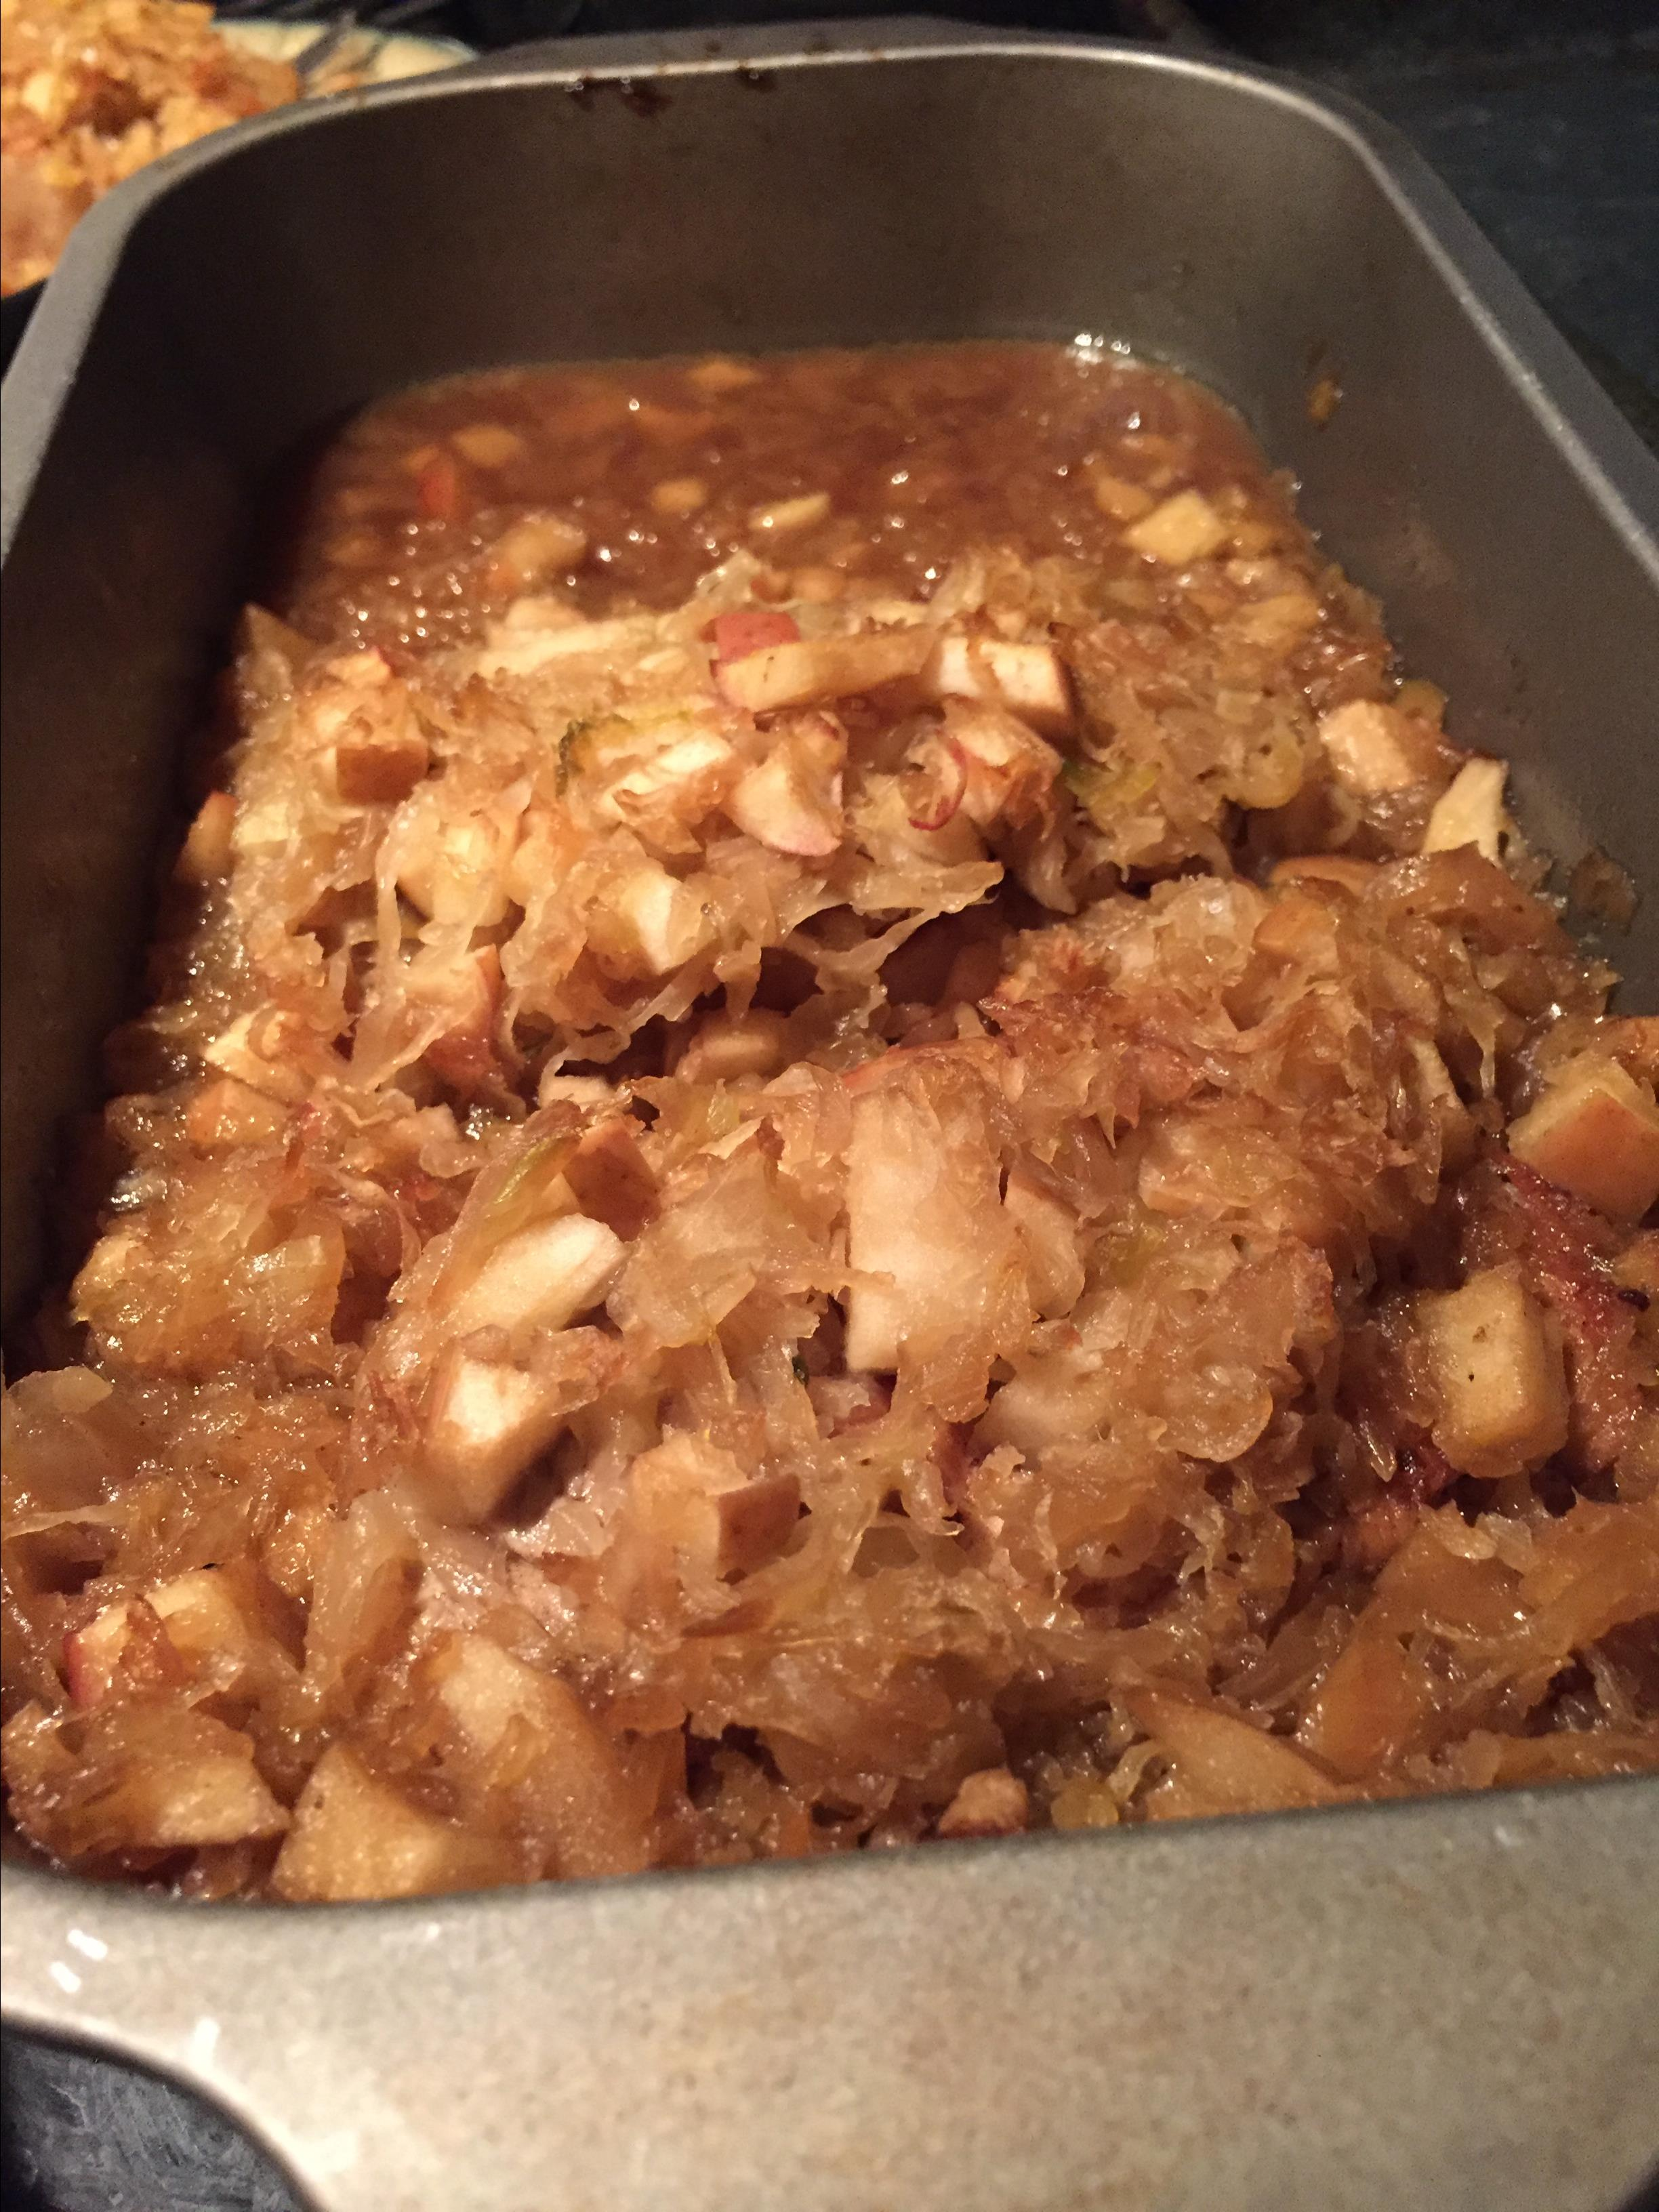 German Pork Chops and Sauerkraut Brian LaCourse